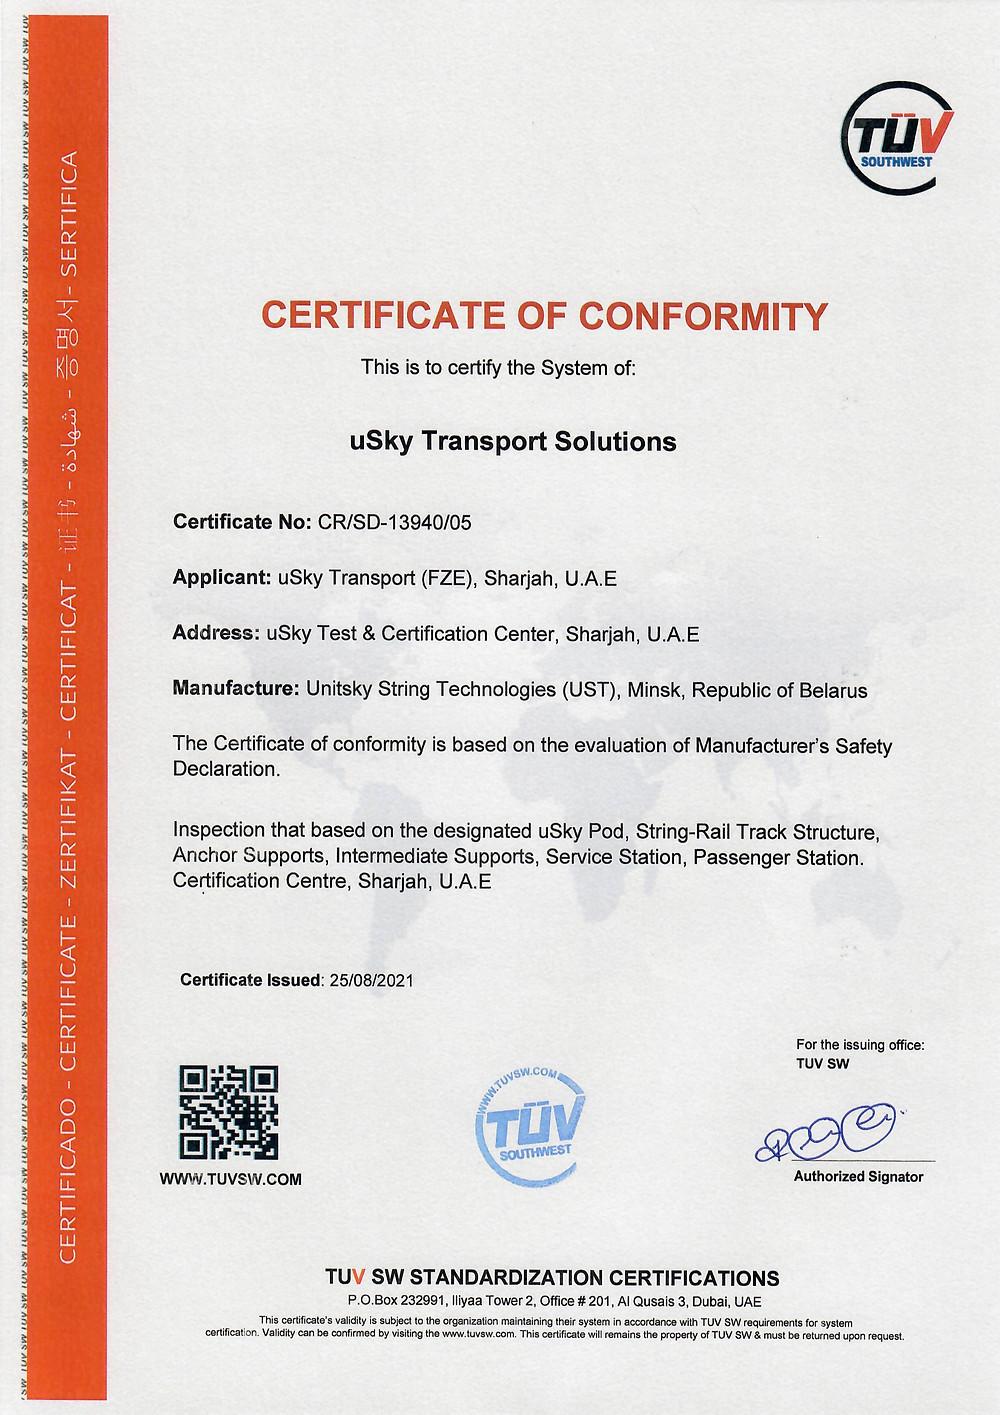 TUV SW Certificate of Conformity